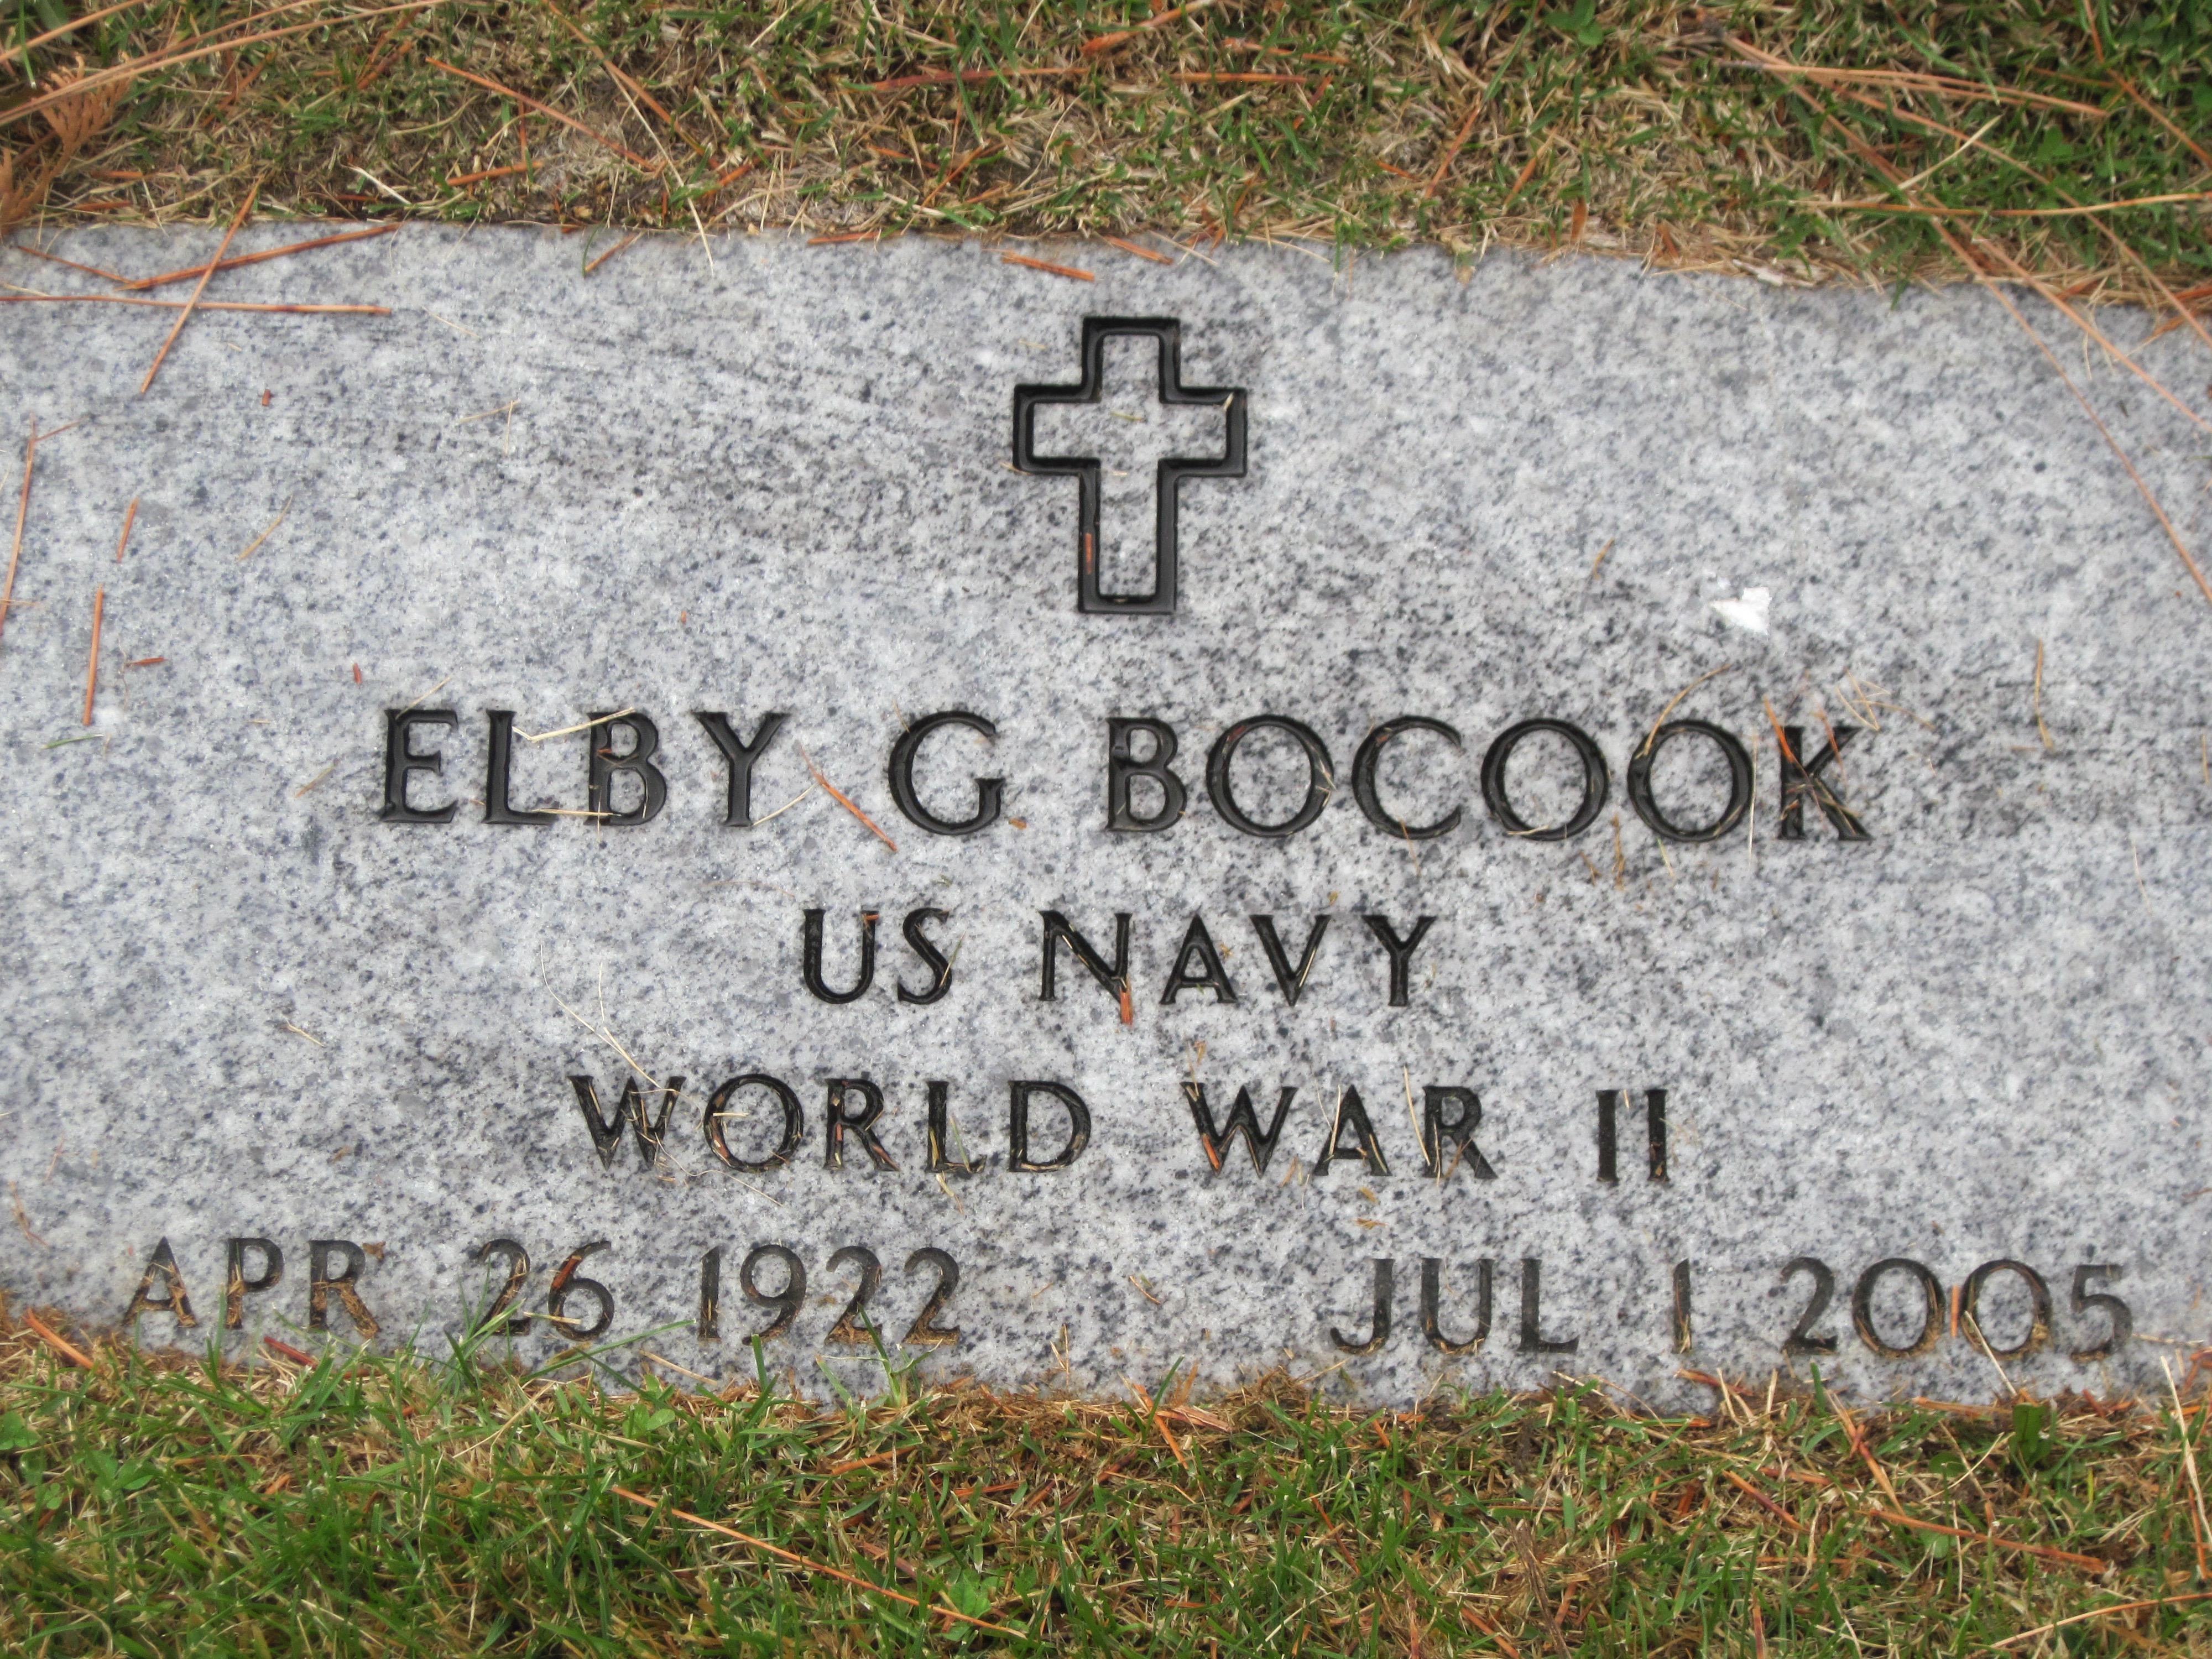 Elby G Bocook